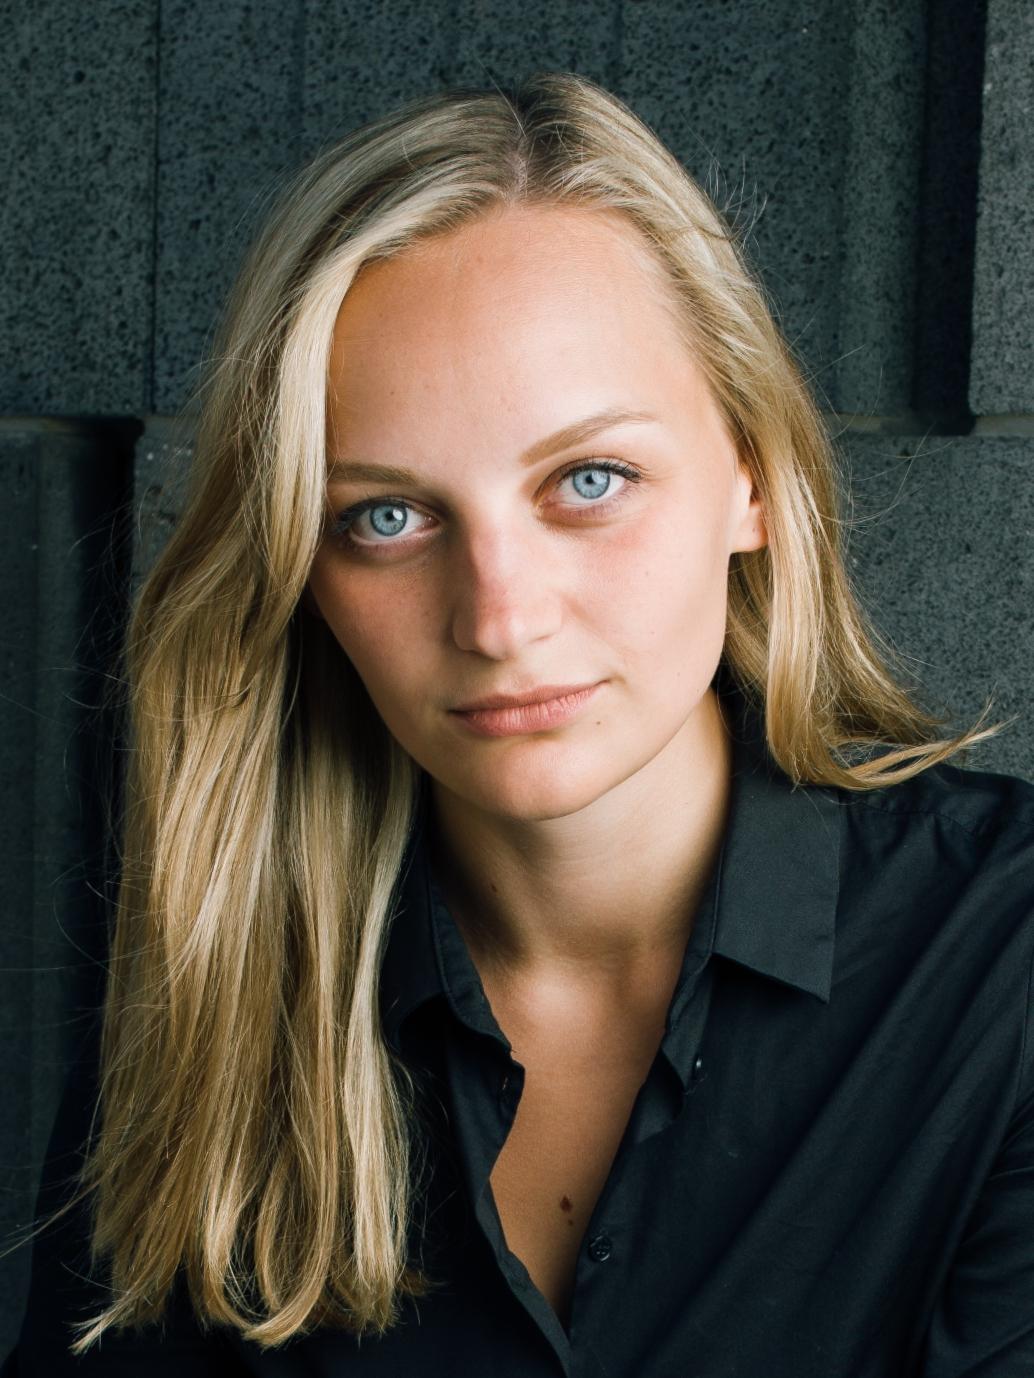 Anna Zöch frontaler Blick